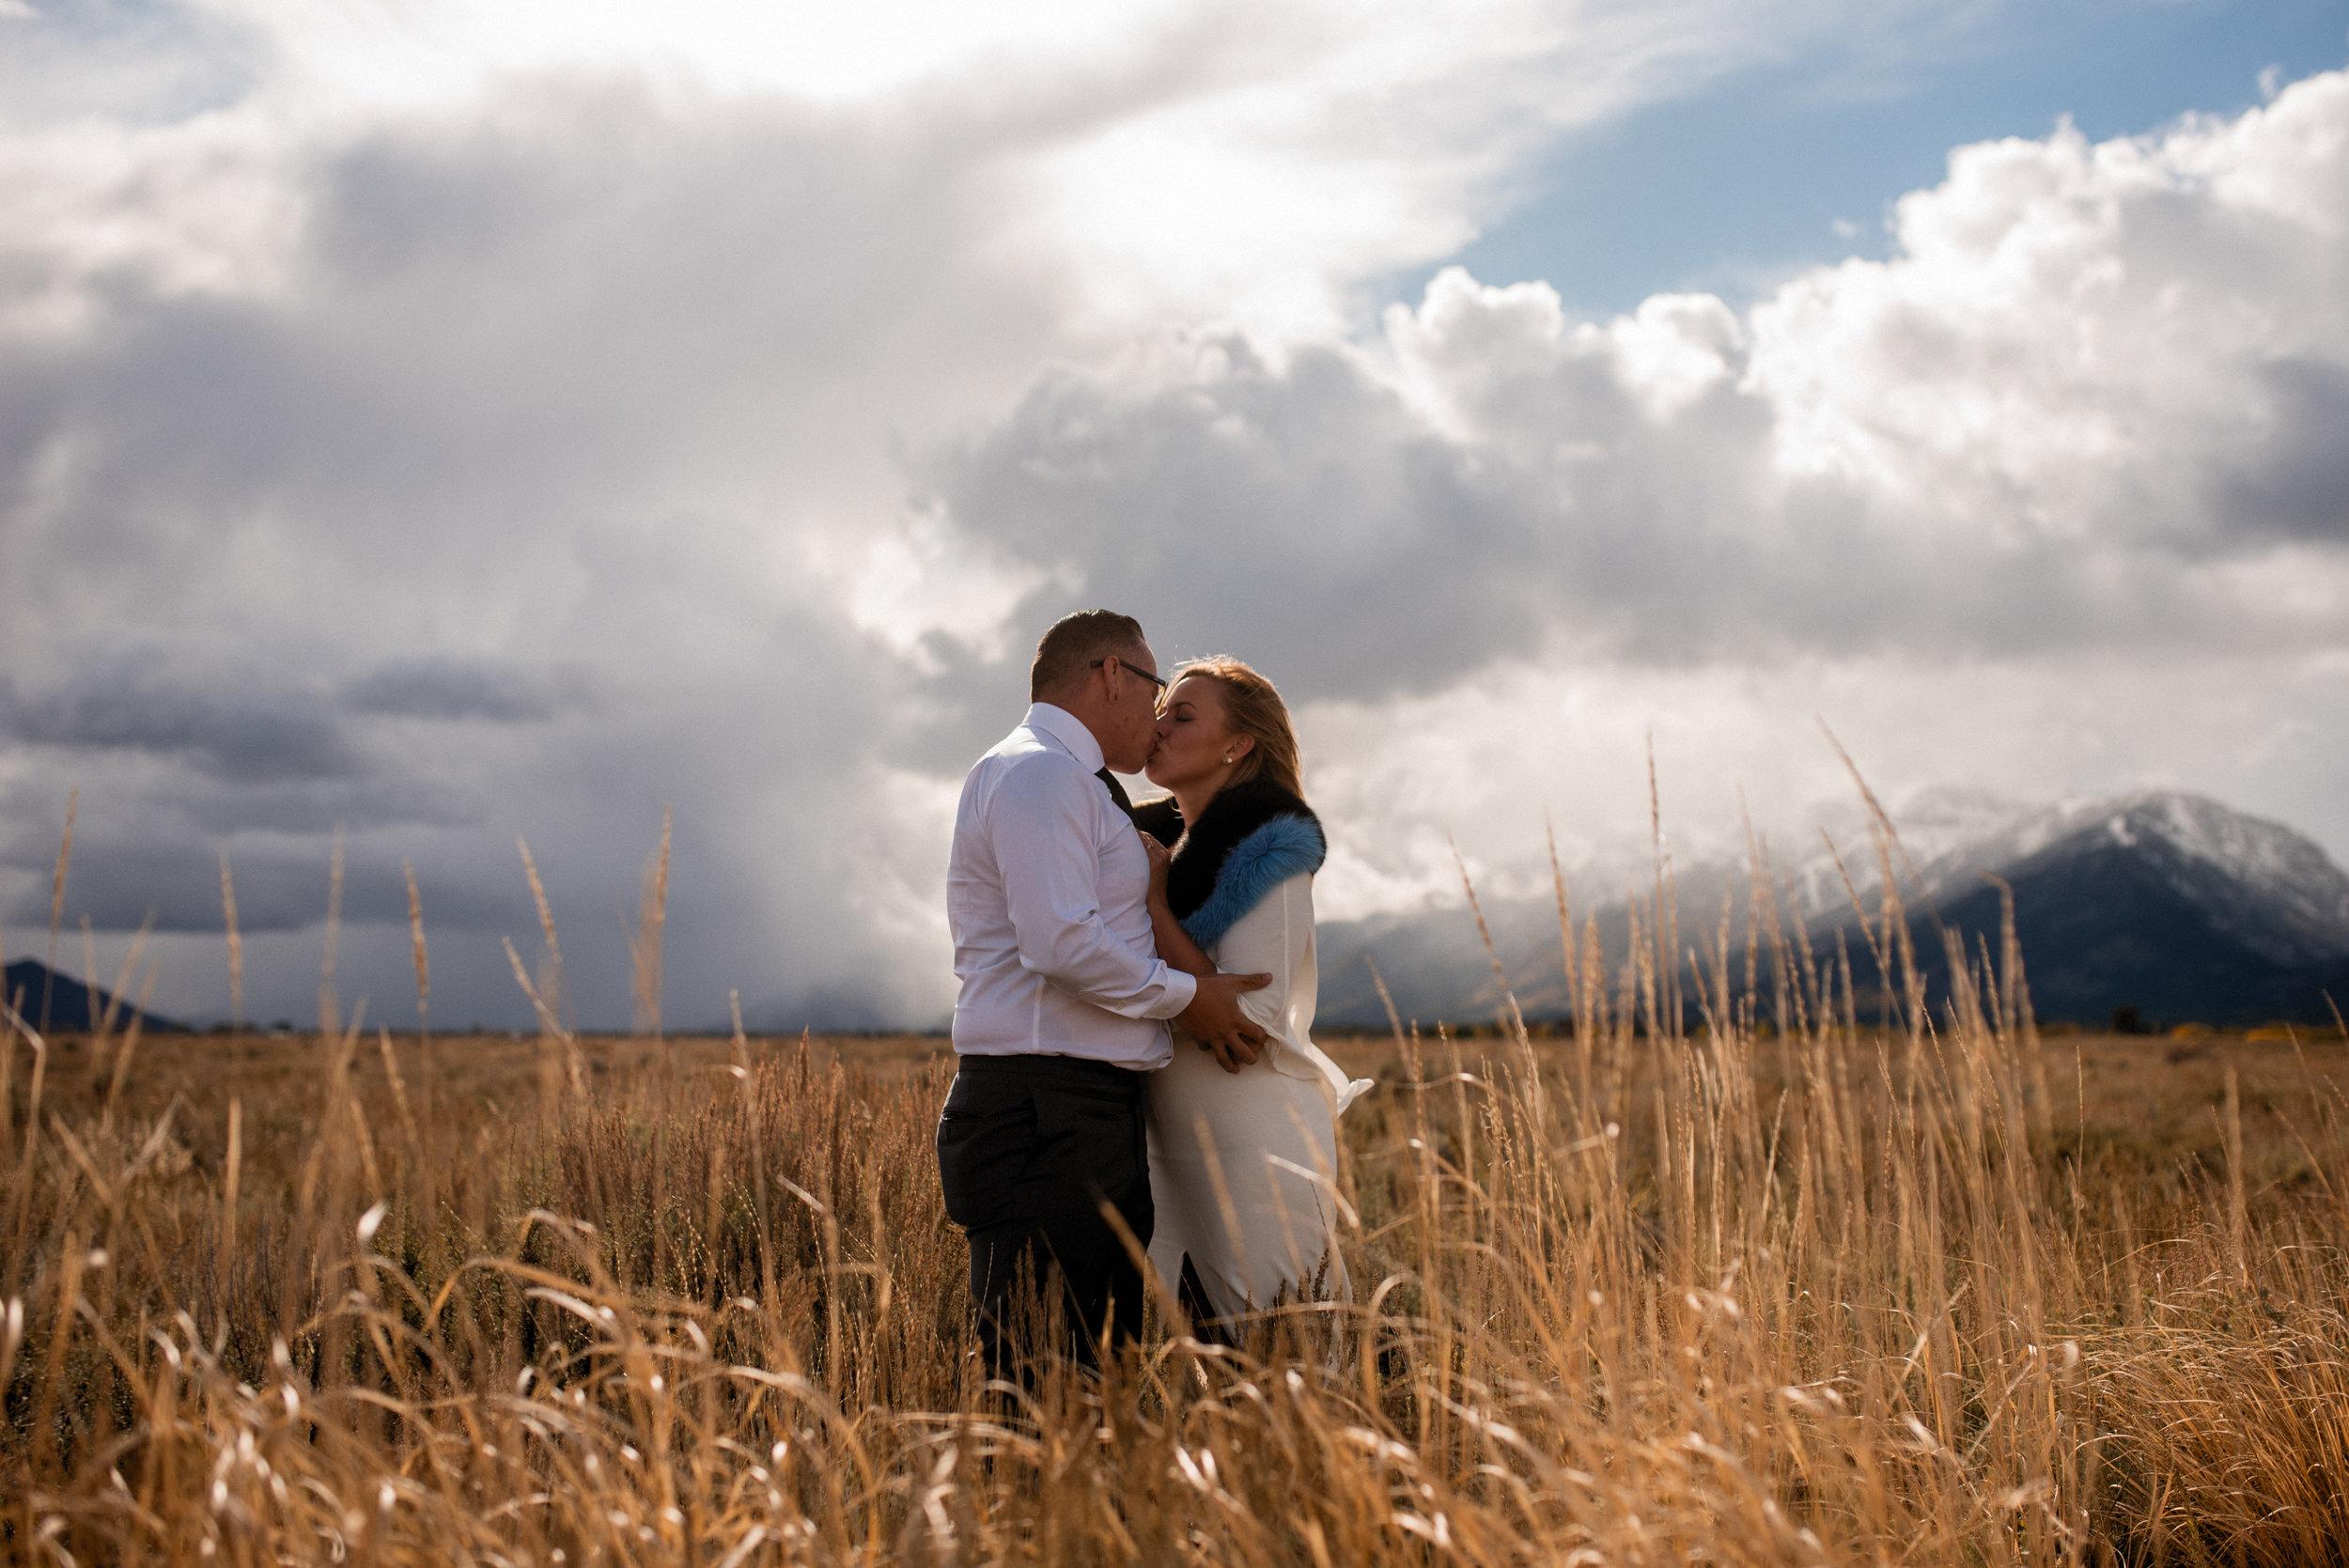 Jackson_Hole_Wedding_Photography_Wyoming_Elopement_Destination_Wedding_Photographer-41.jpg